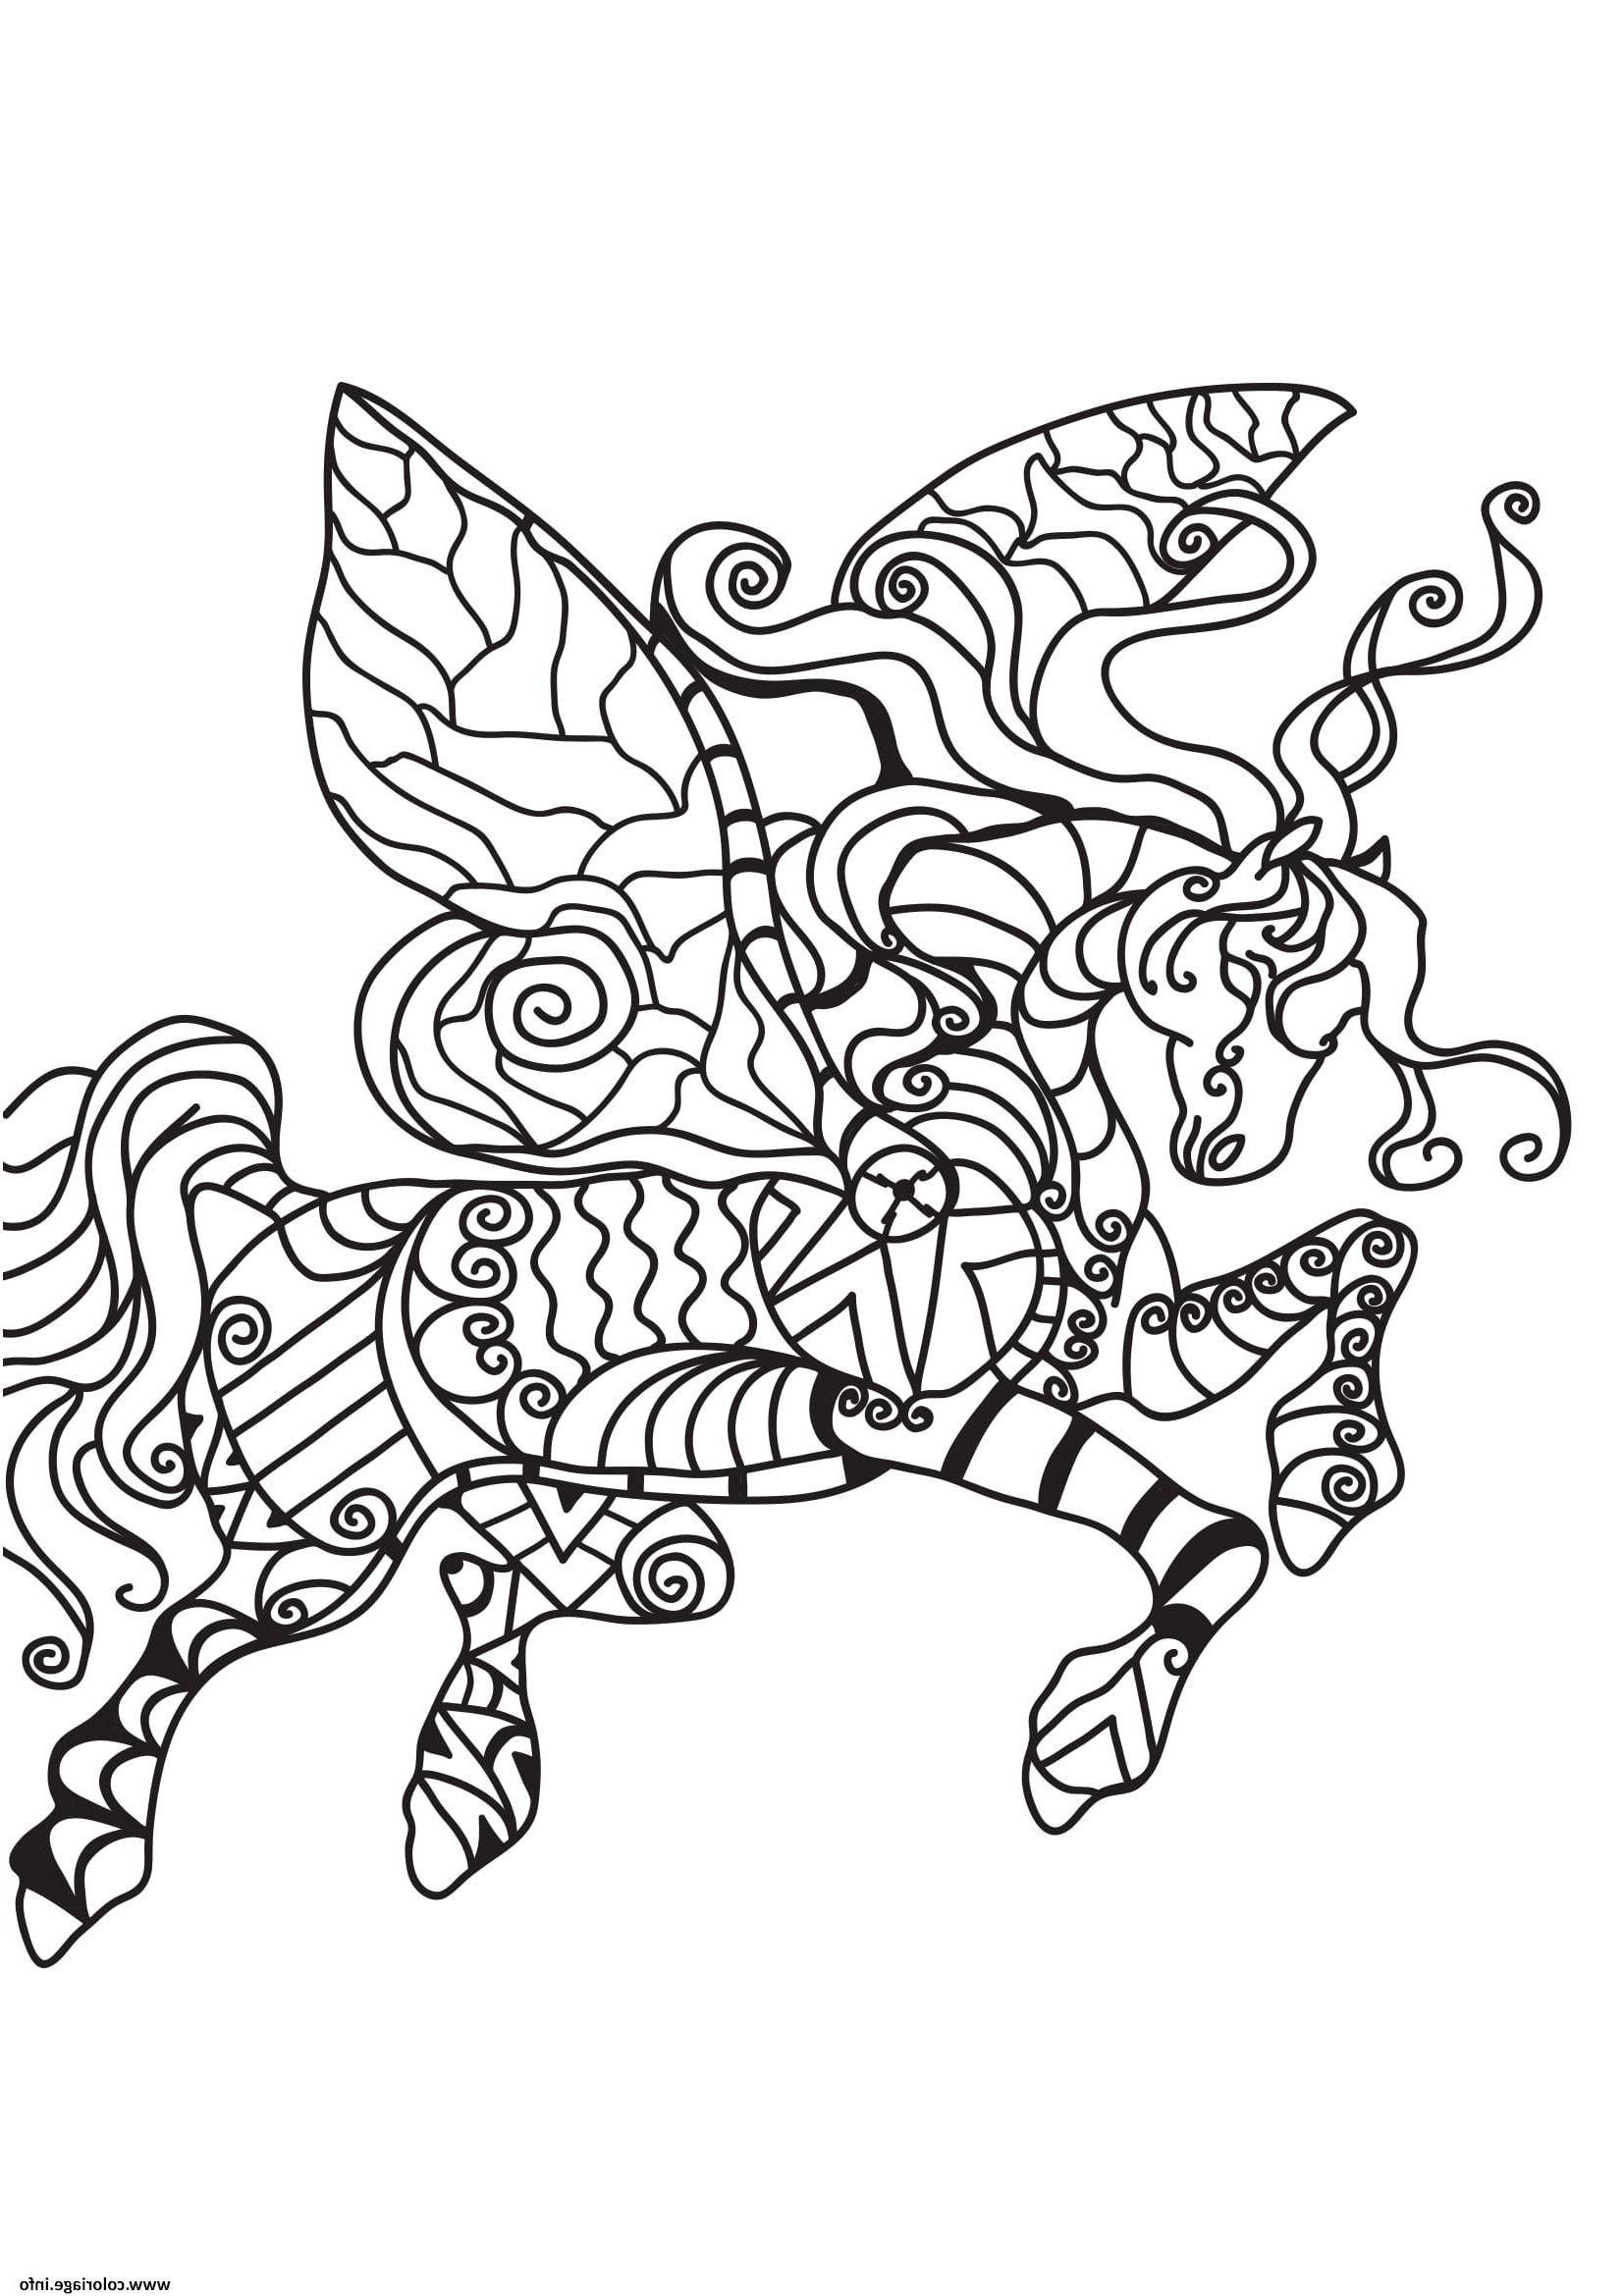 Coloriage Sirene Licorne djdareve en 2020 | Coloriage ...